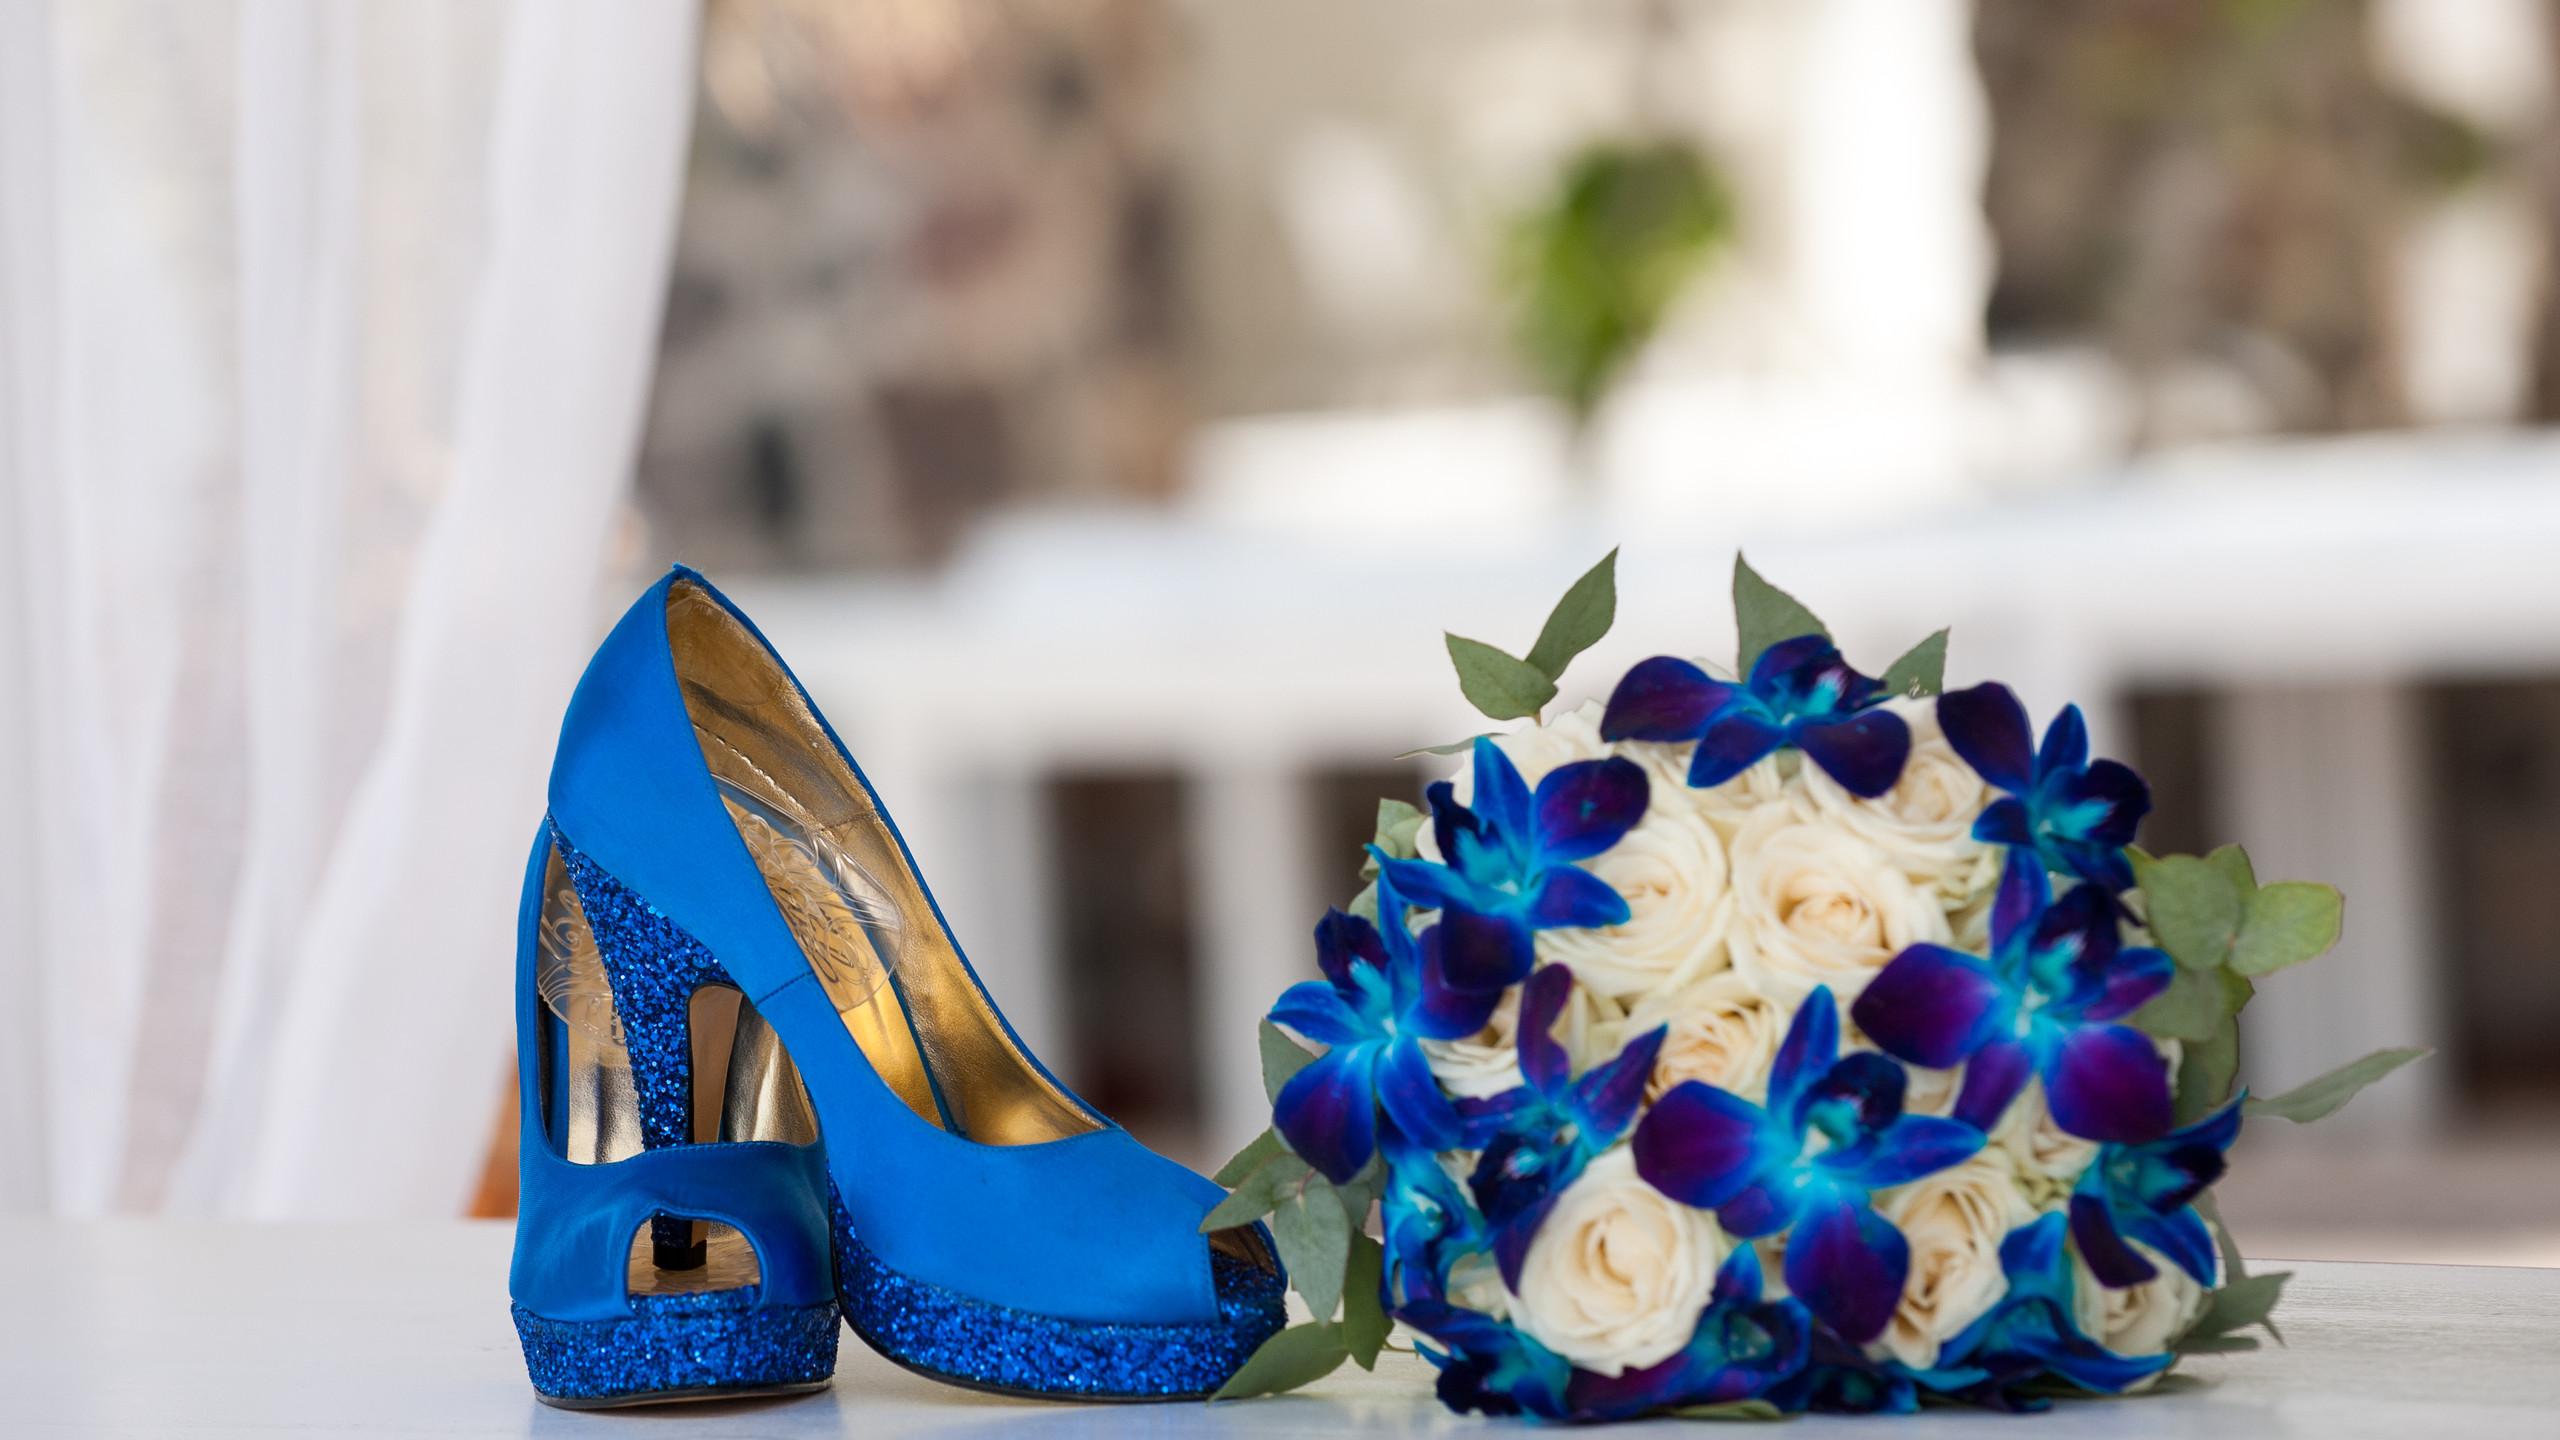 Greek wedding palnners